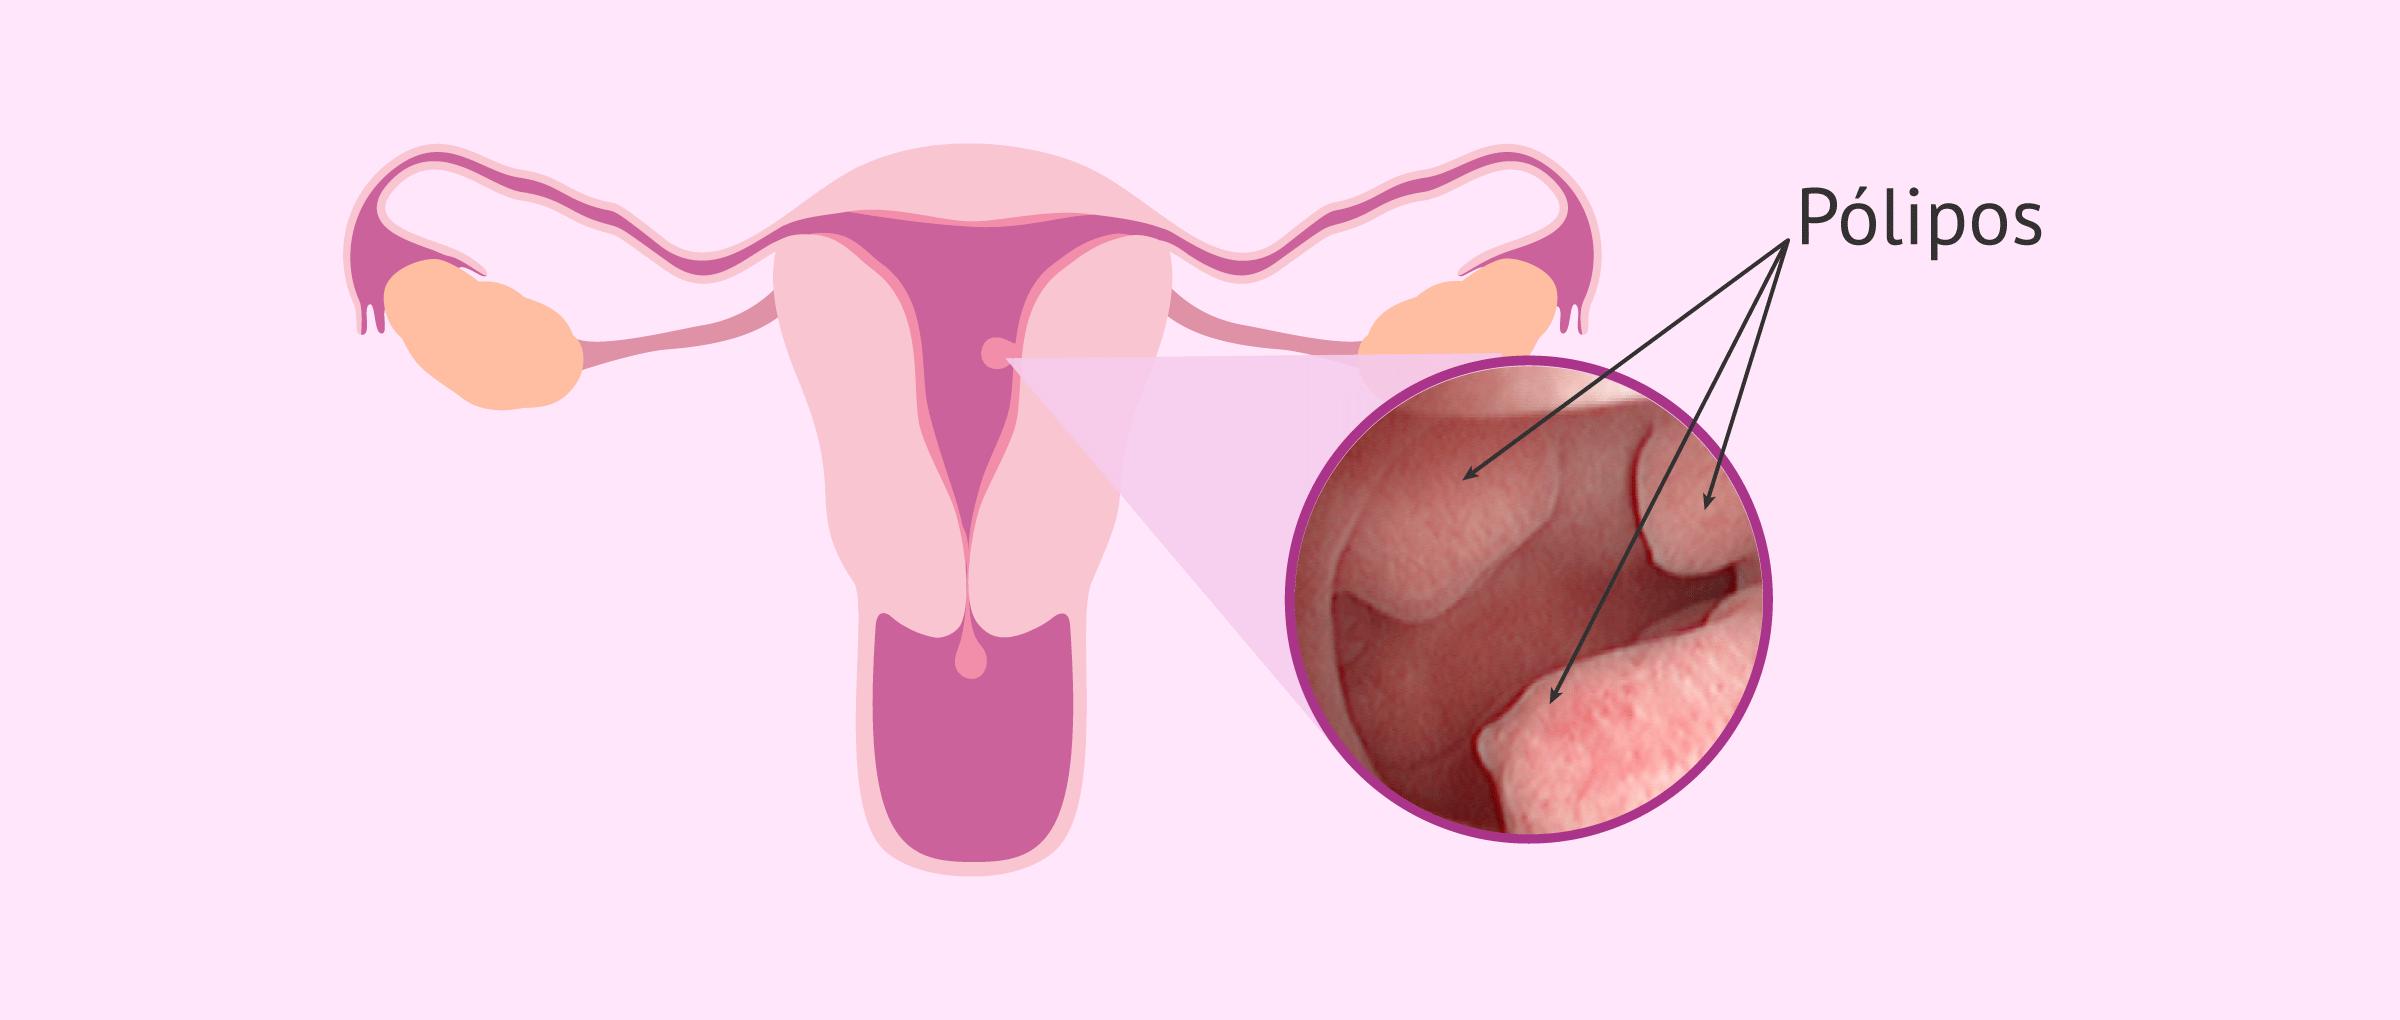 Cancer endometrial mujer joven, Vrei Sa Fi Milionar Joc En Romana Descargar » punctultau.ro